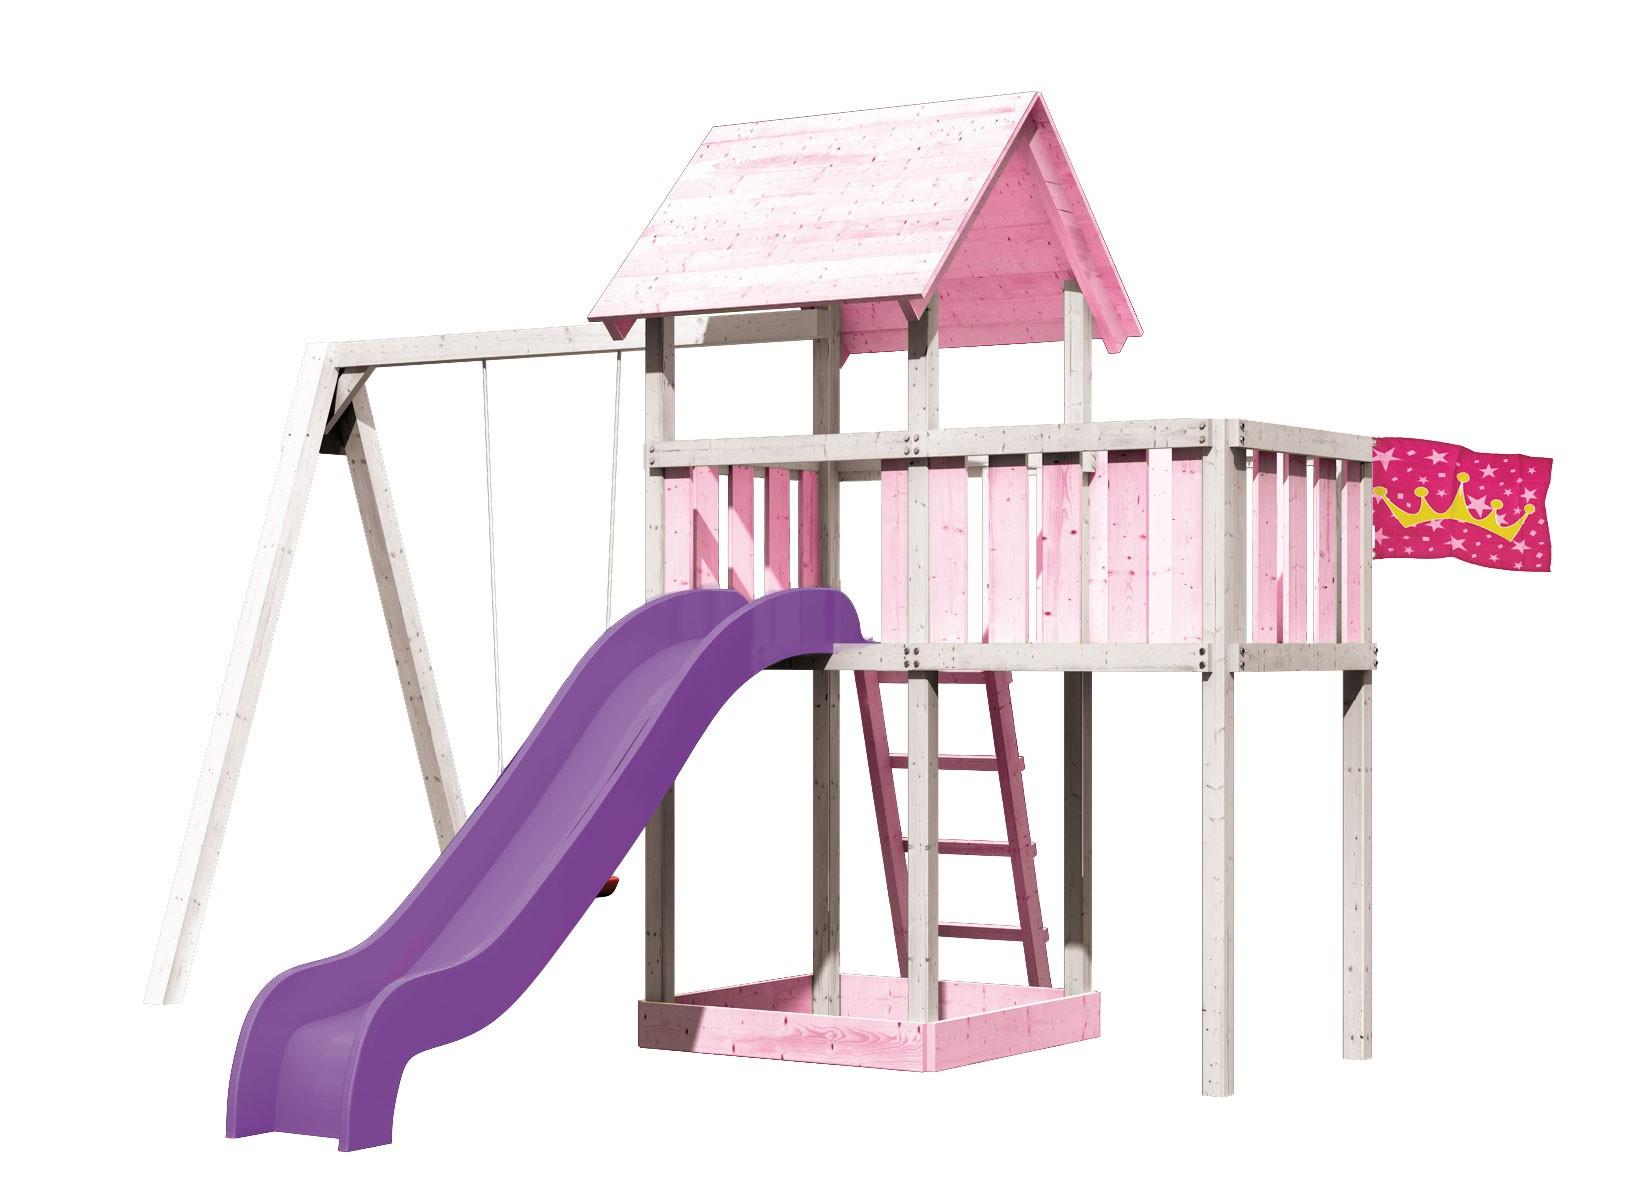 Bevorzugt Spielturm Lotti Set Farbe Karibu Akubi natur Anbau+Schaukel+ YX17